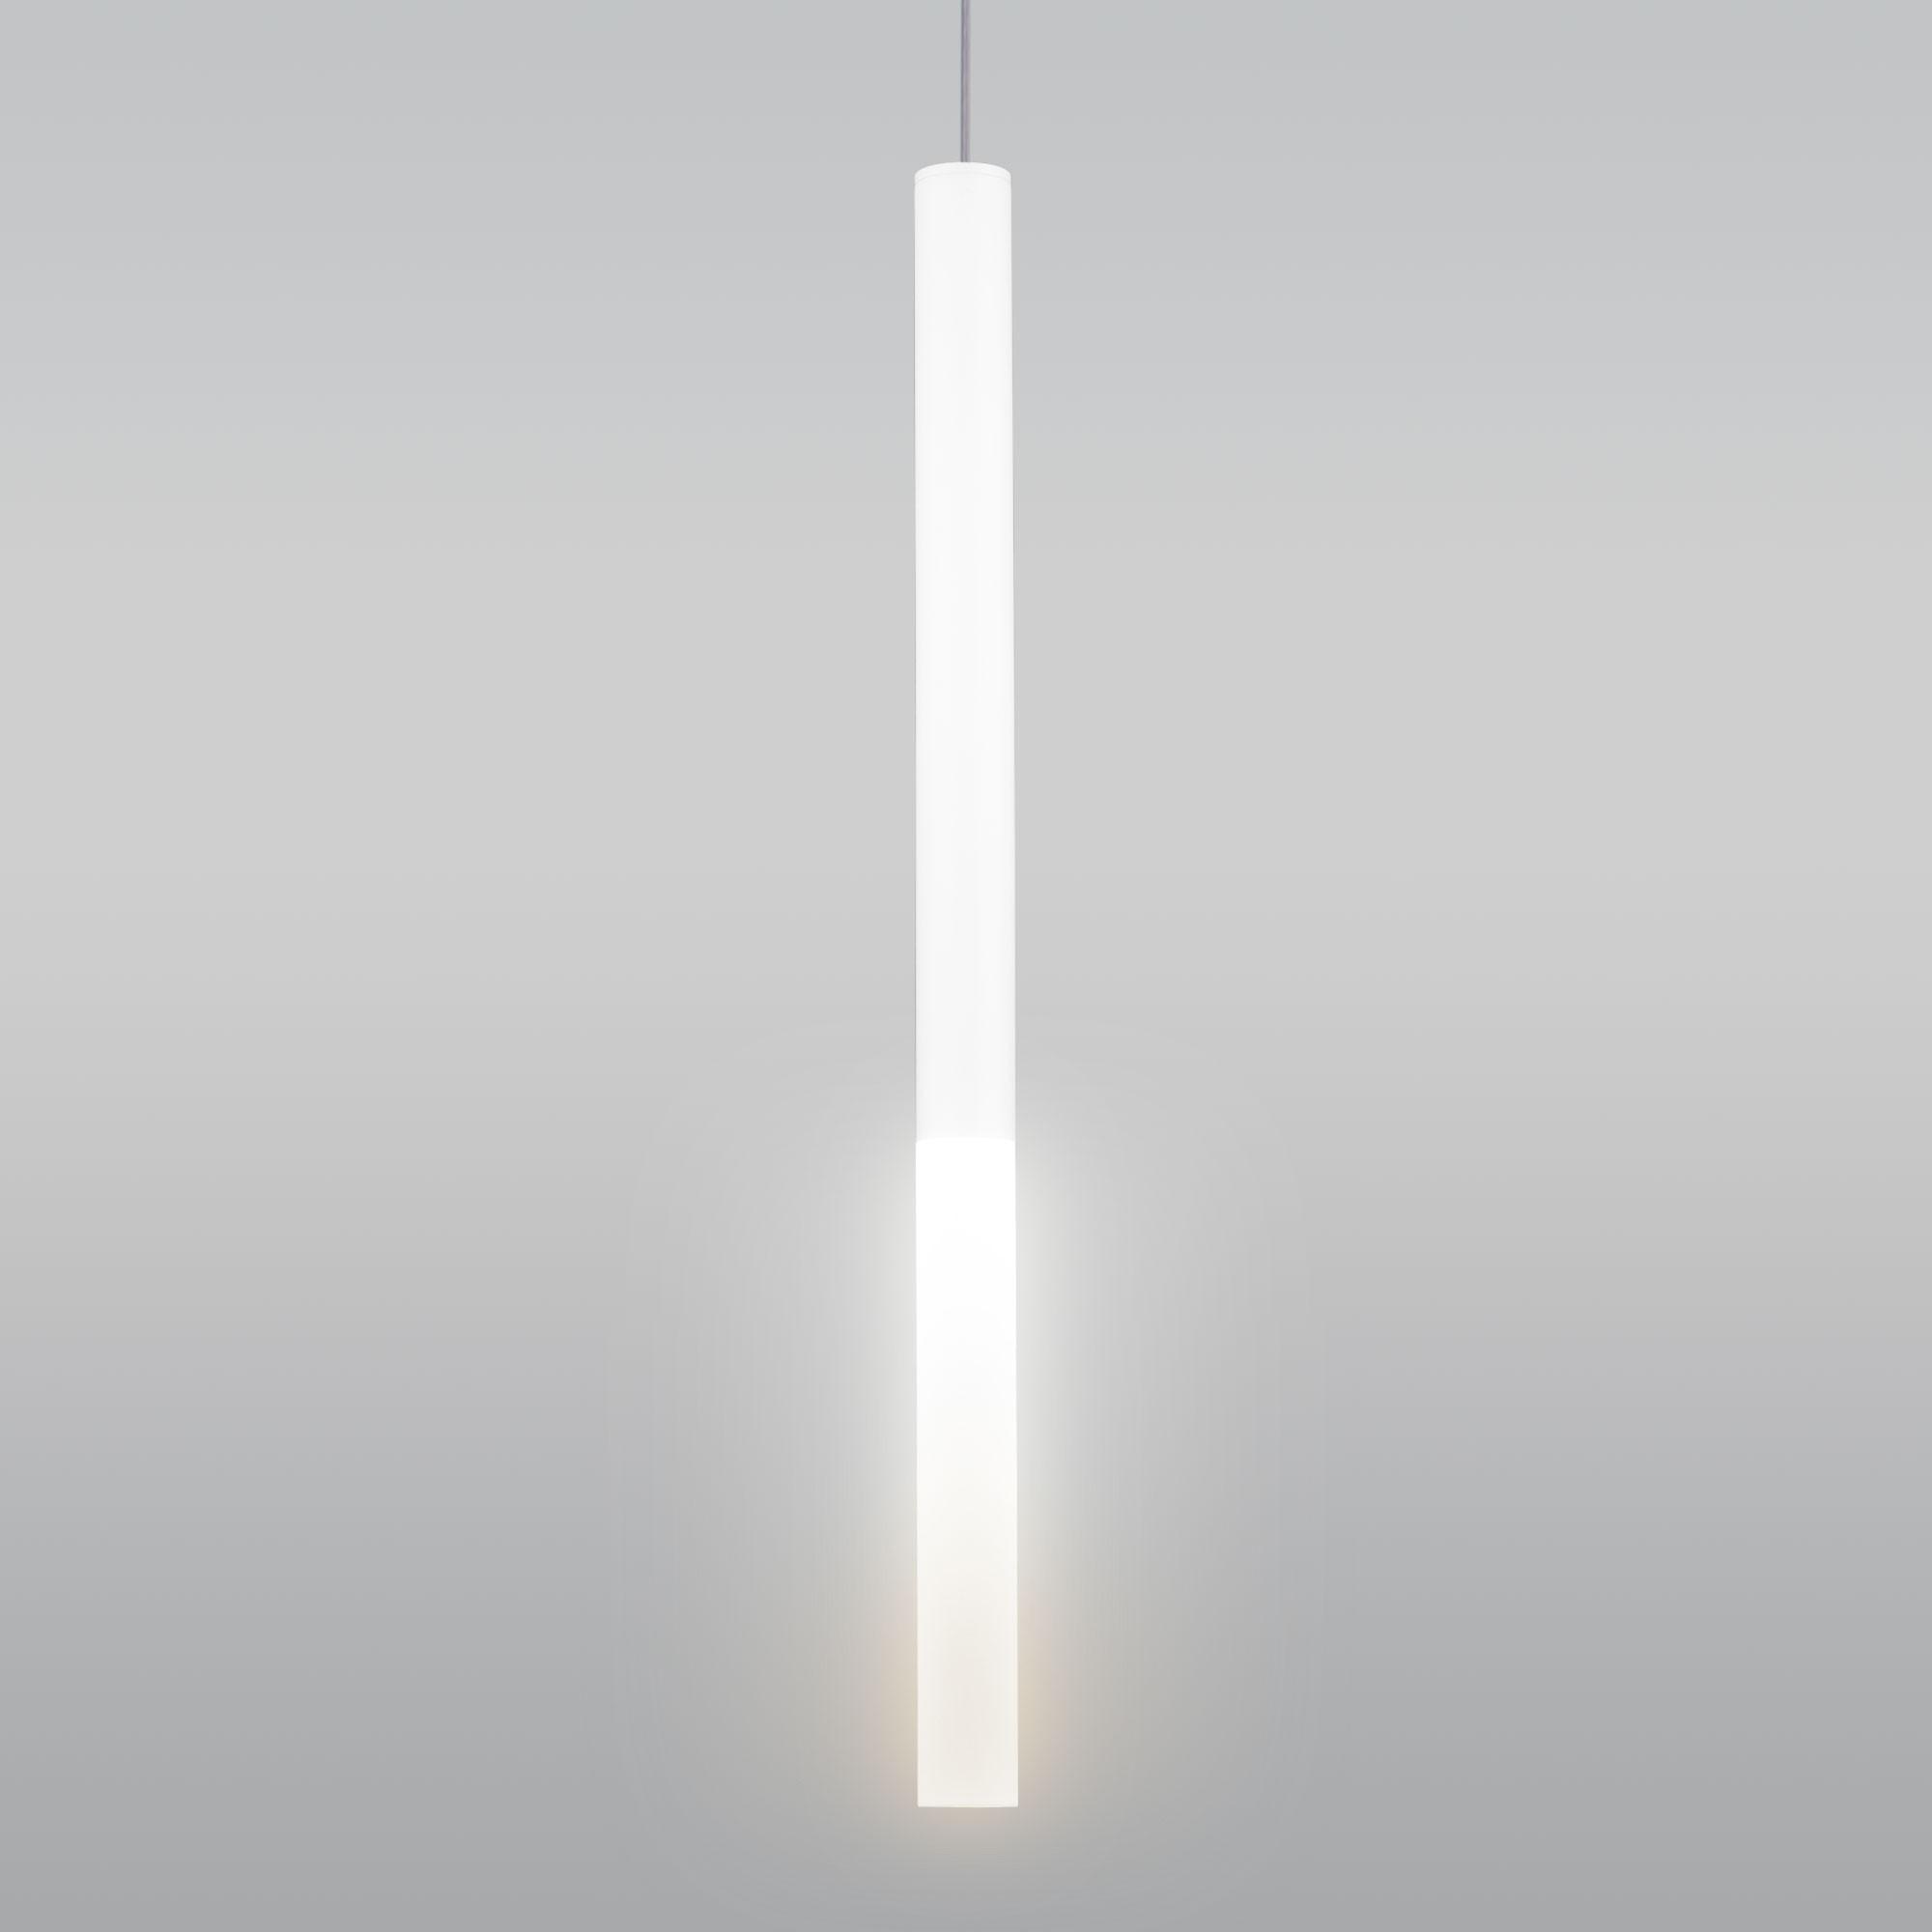 DLR040 4W 4200K белый матовый